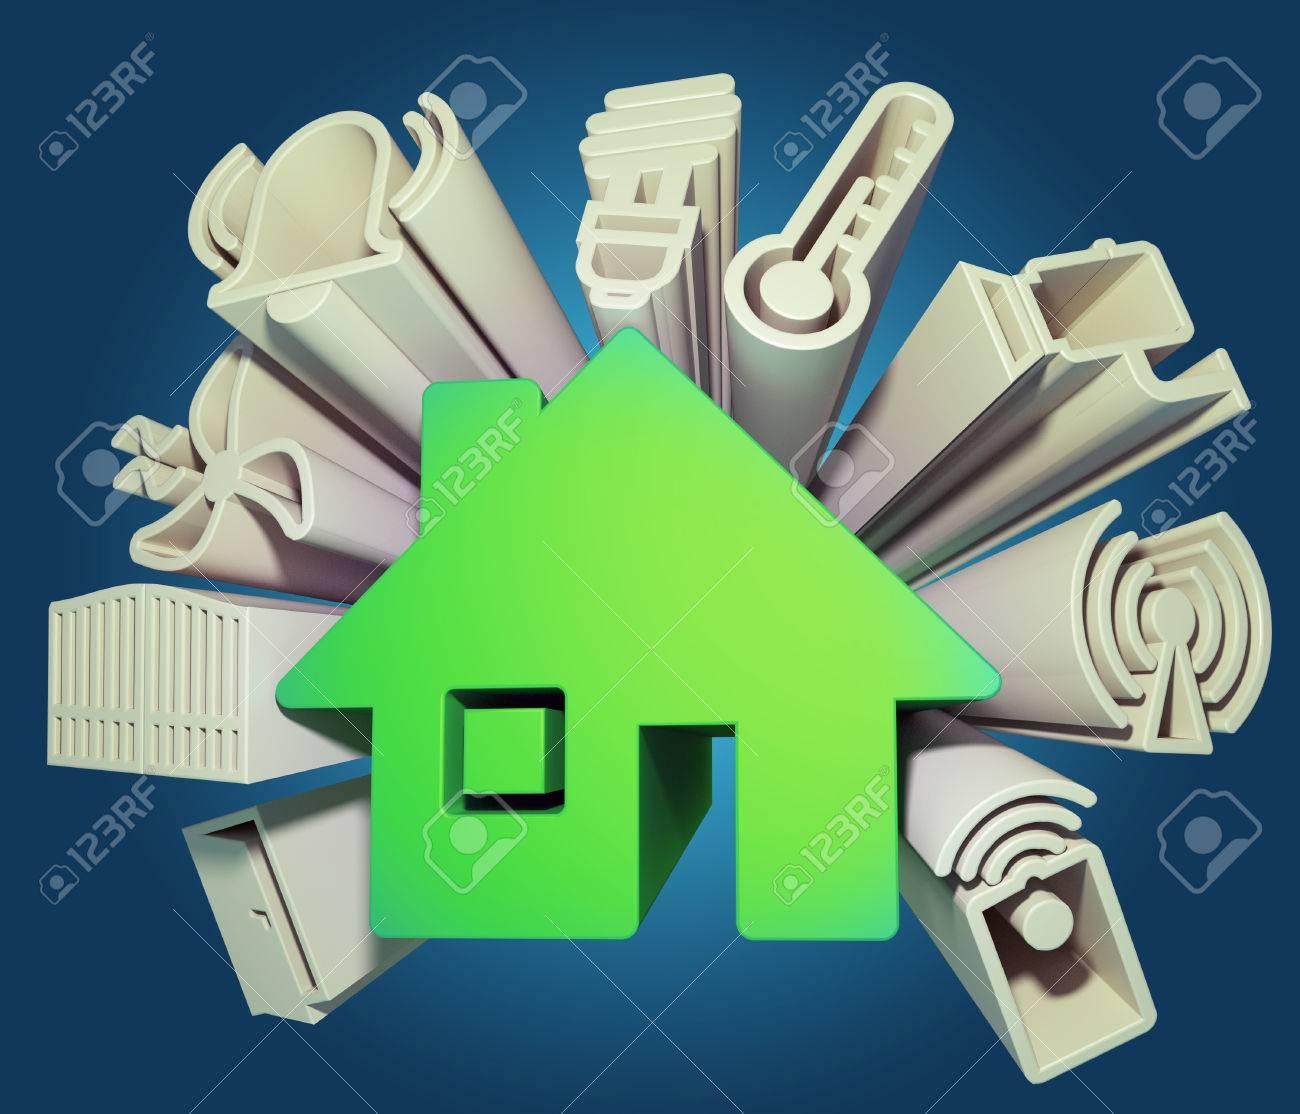 3d render illustration of icons symbolizing the smart home - 49160681